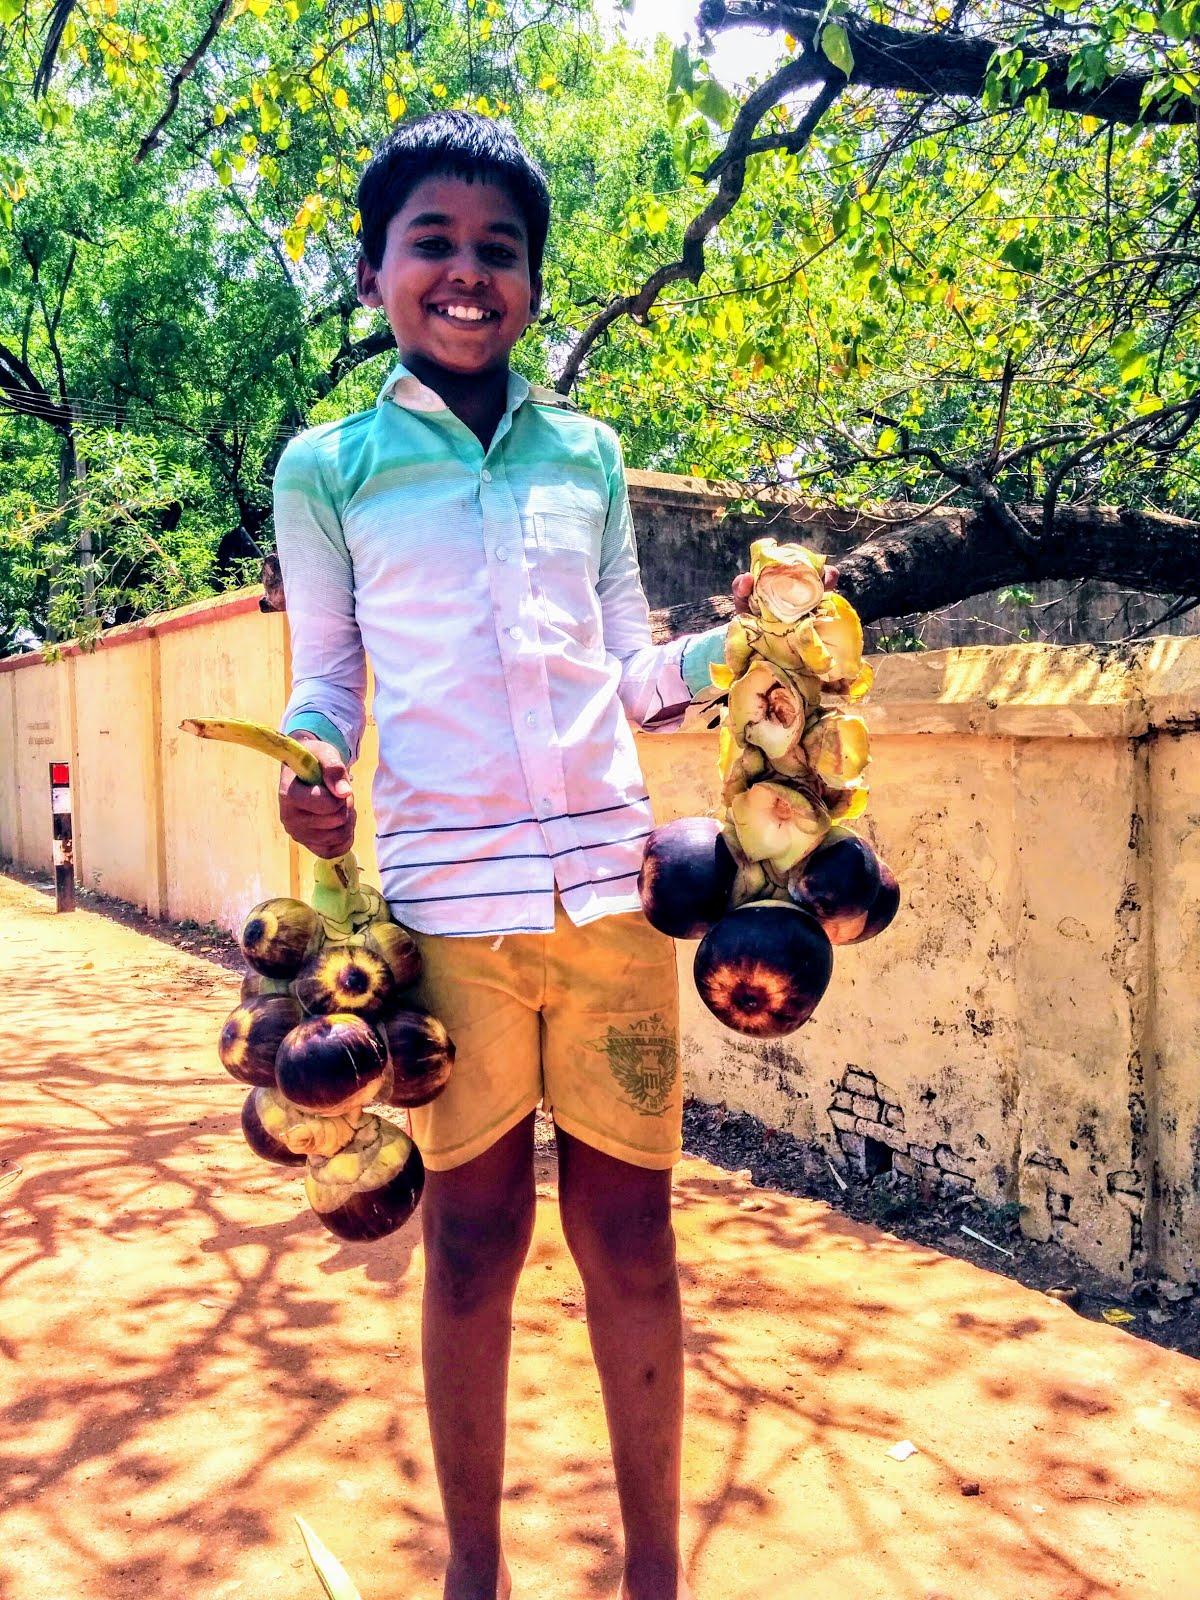 Kid all smiles with his Palm fruit at Kallidaikurichi